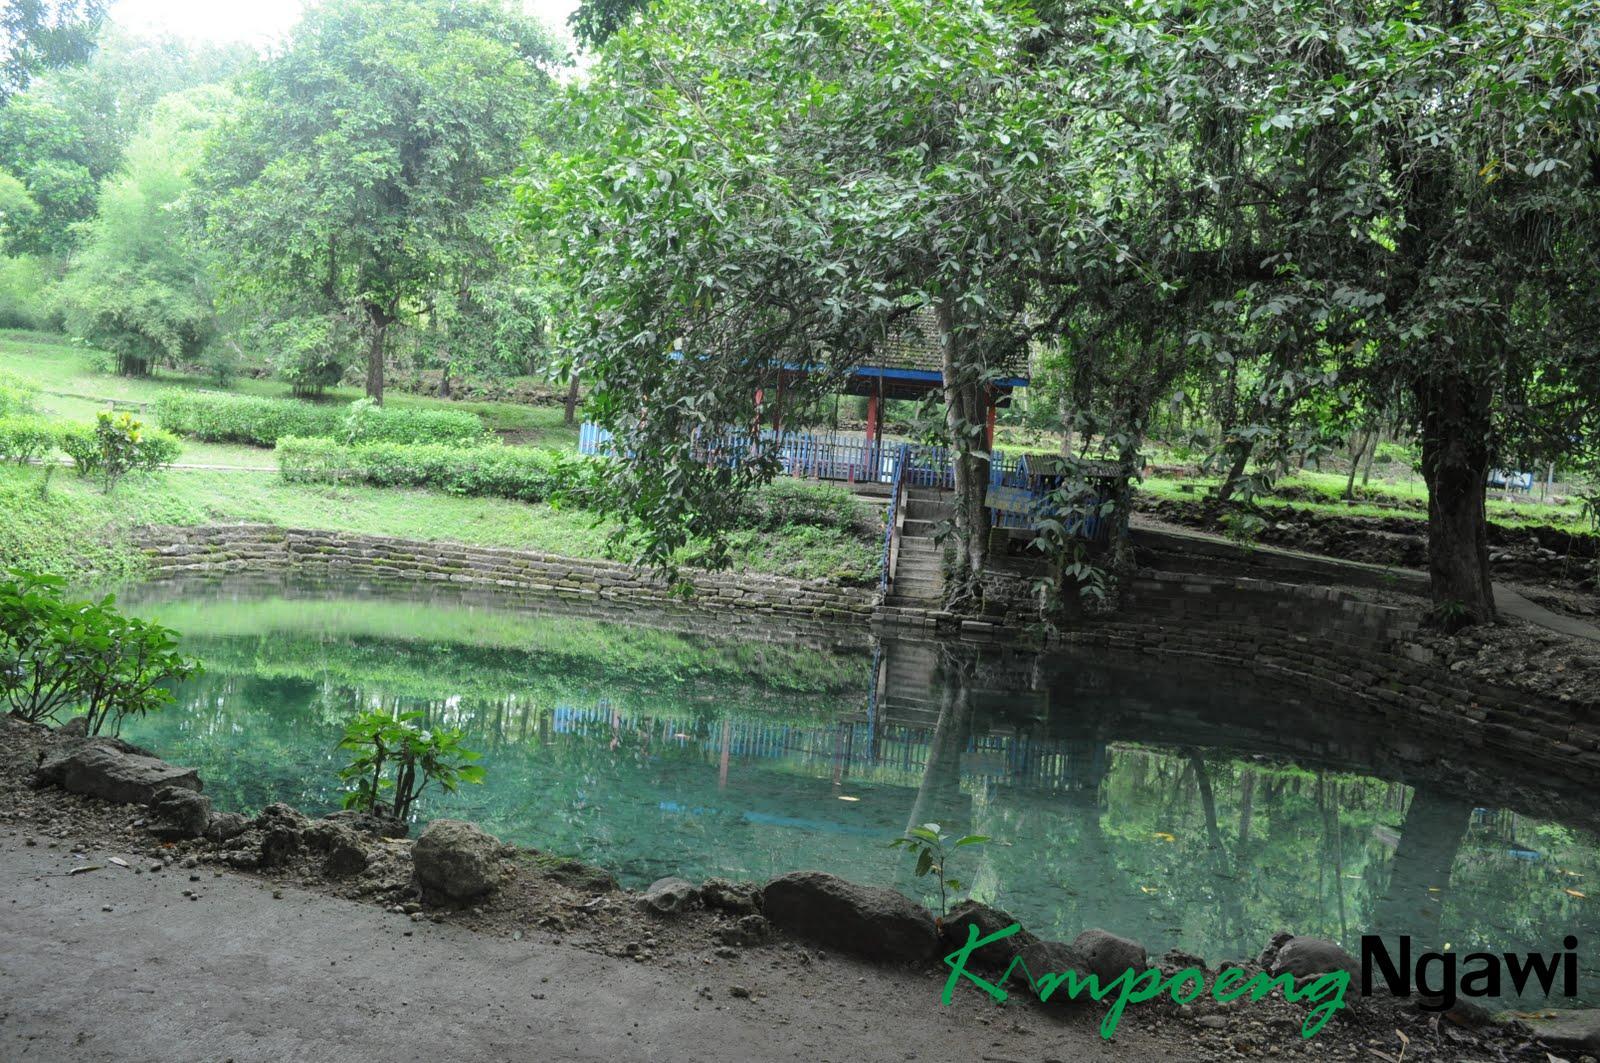 Wisata Archives Kampoengngawi Sendang Tawun Duk Beji Watu Jonggol Kab